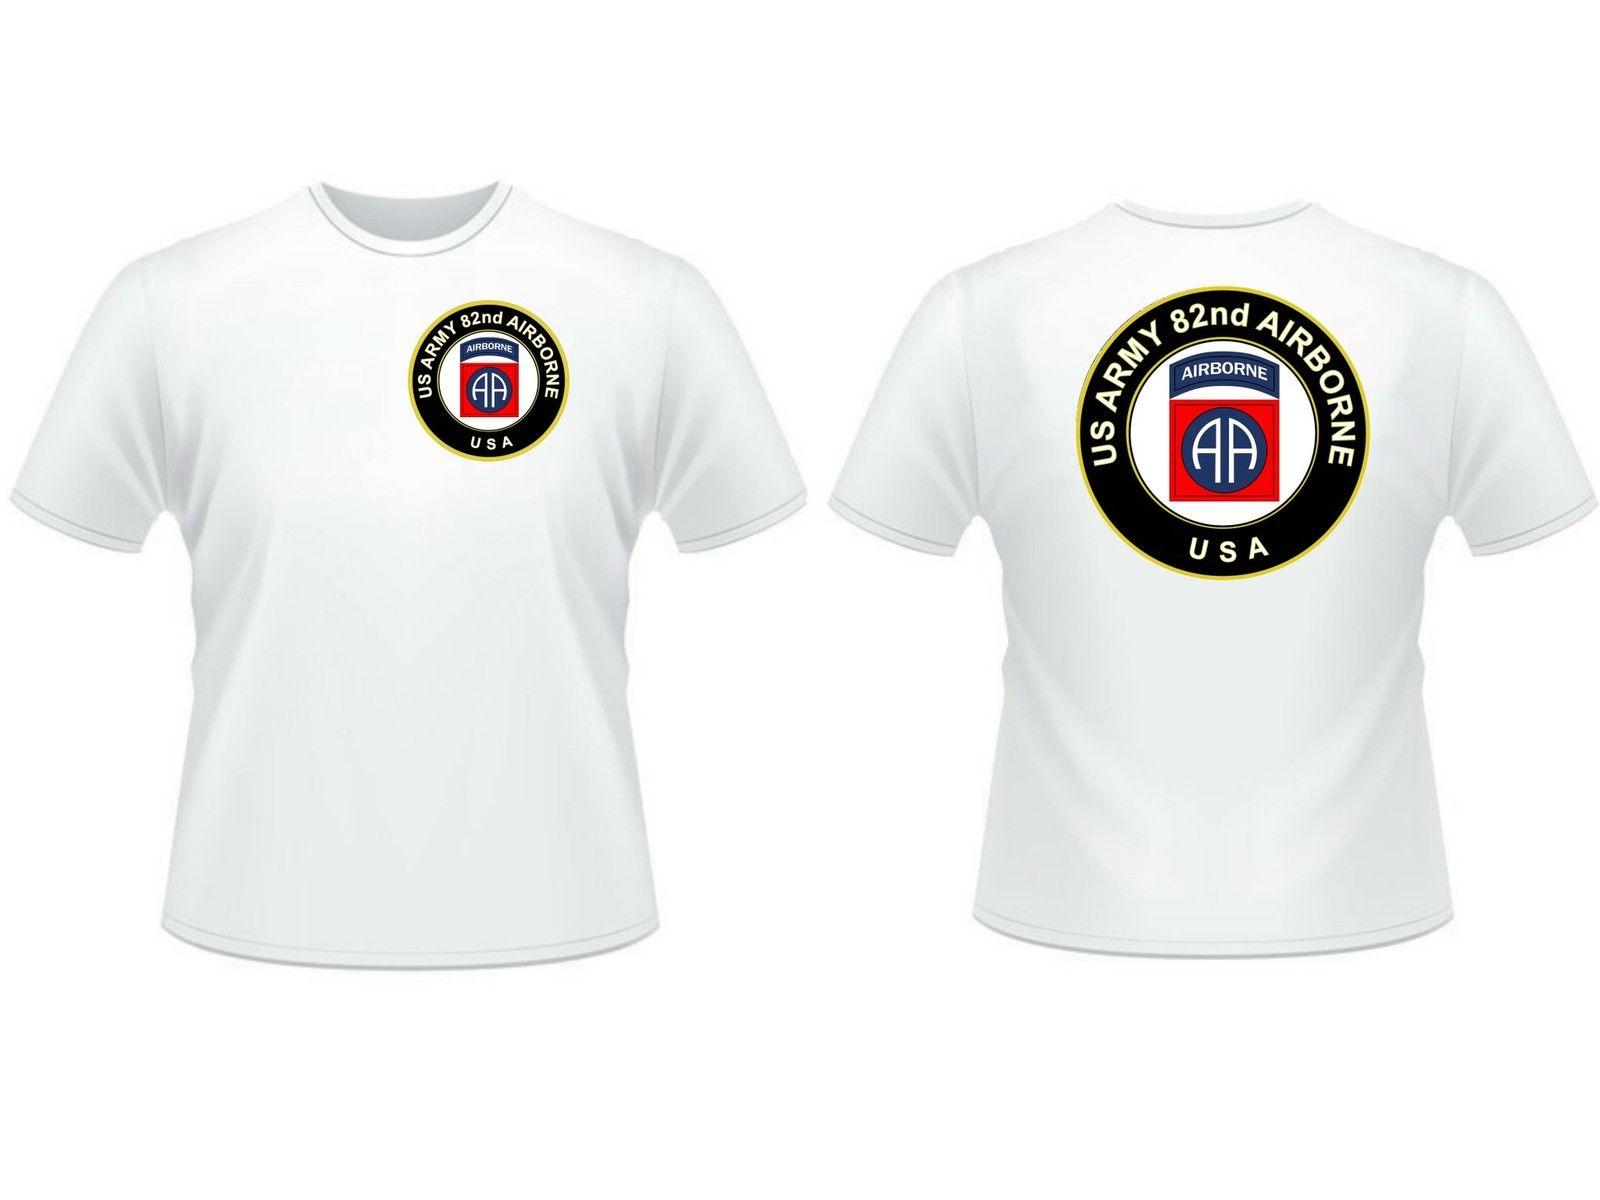 2019 Men Cool Tee Shirt tT-shirt 82 eme airborne US ARMY recto verso TAILLE S M L XL XXL ww2 Summer T-shirt